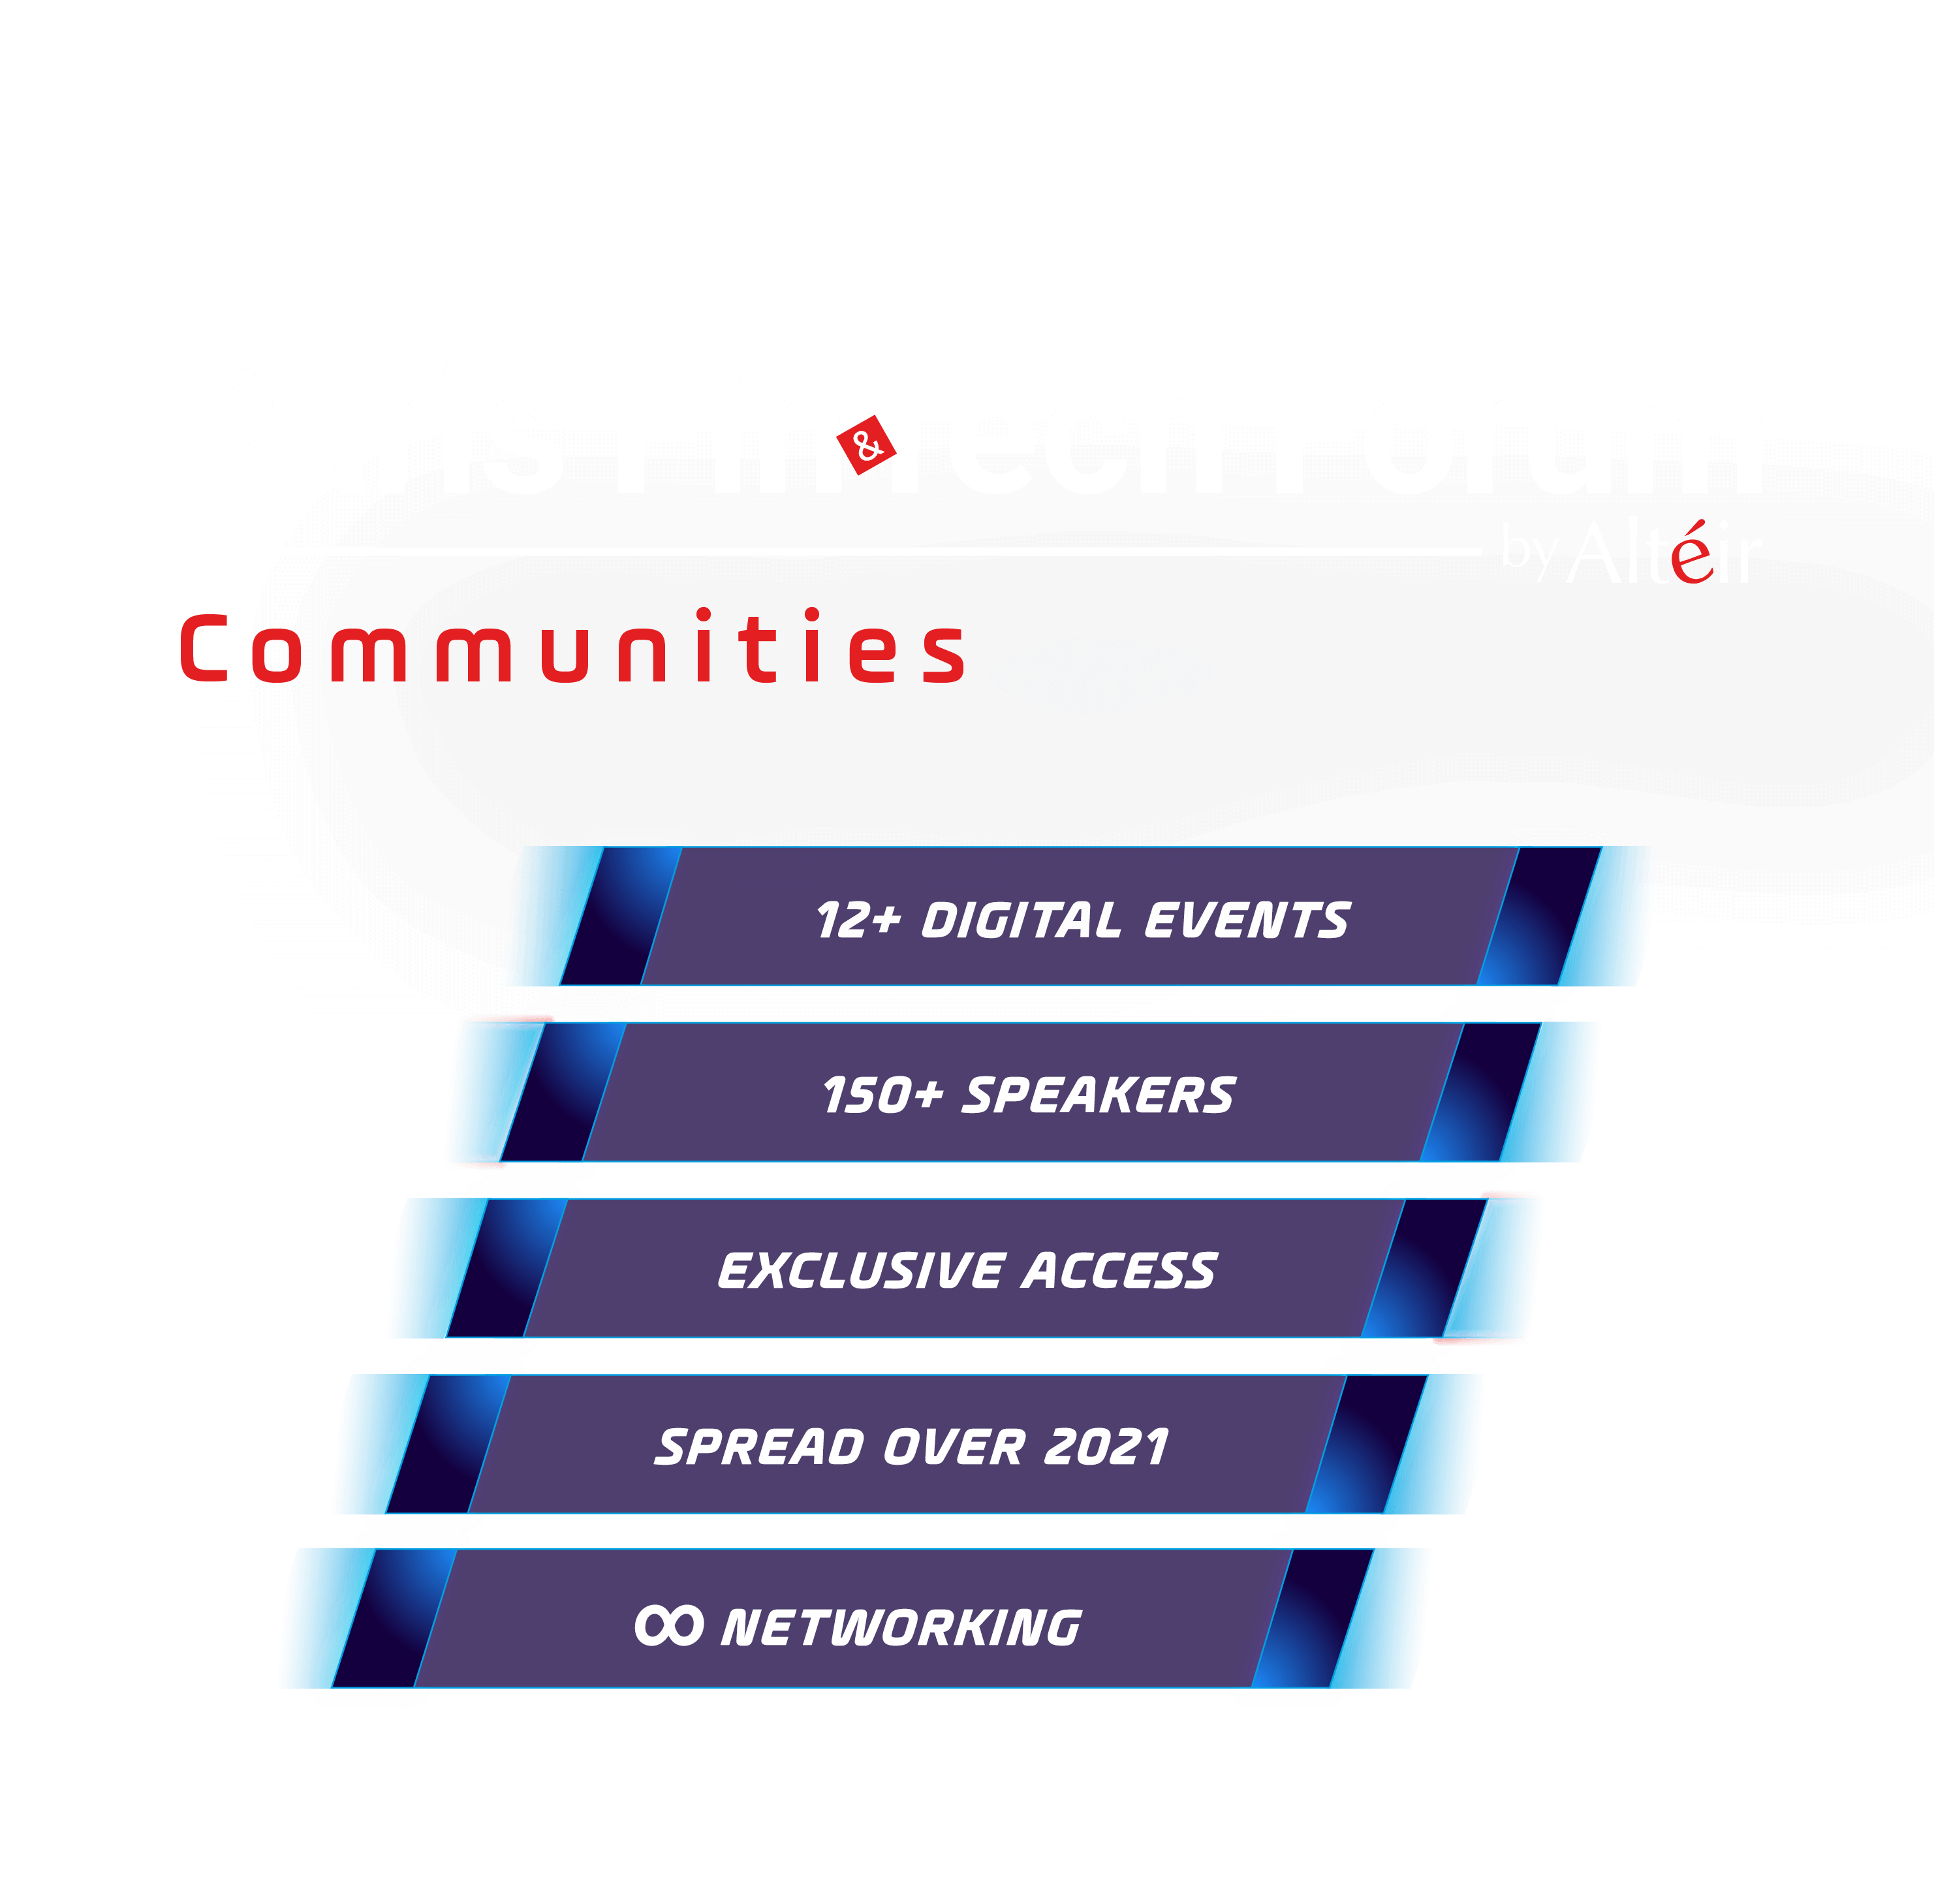 Paris Fintech Forum 2021